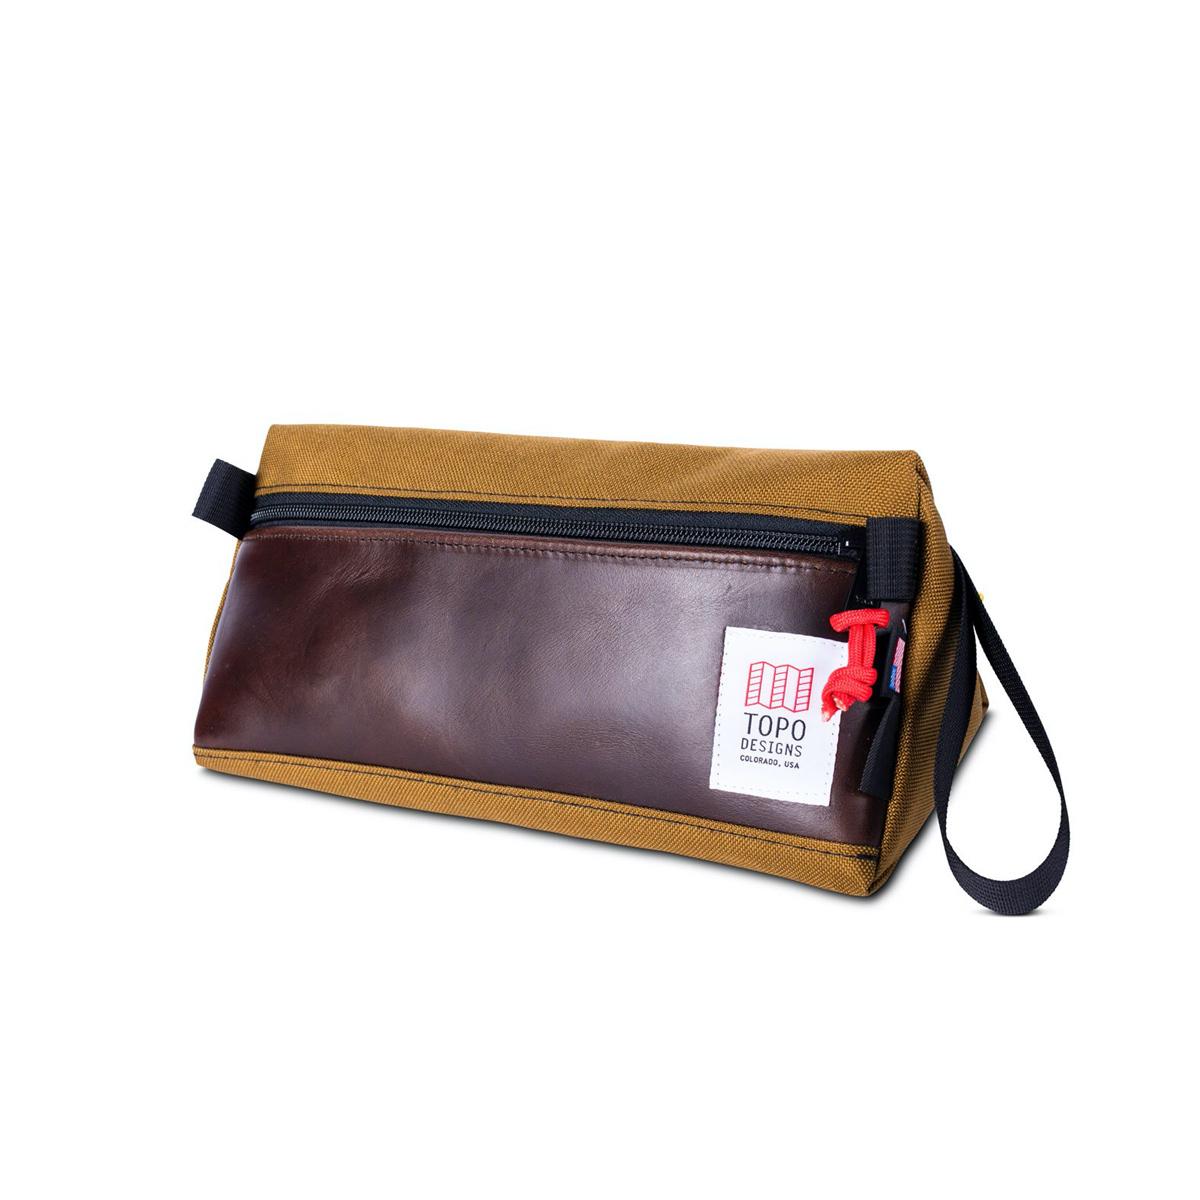 Topo Designs Dopp Kit Heritage Duck/Brown Leather